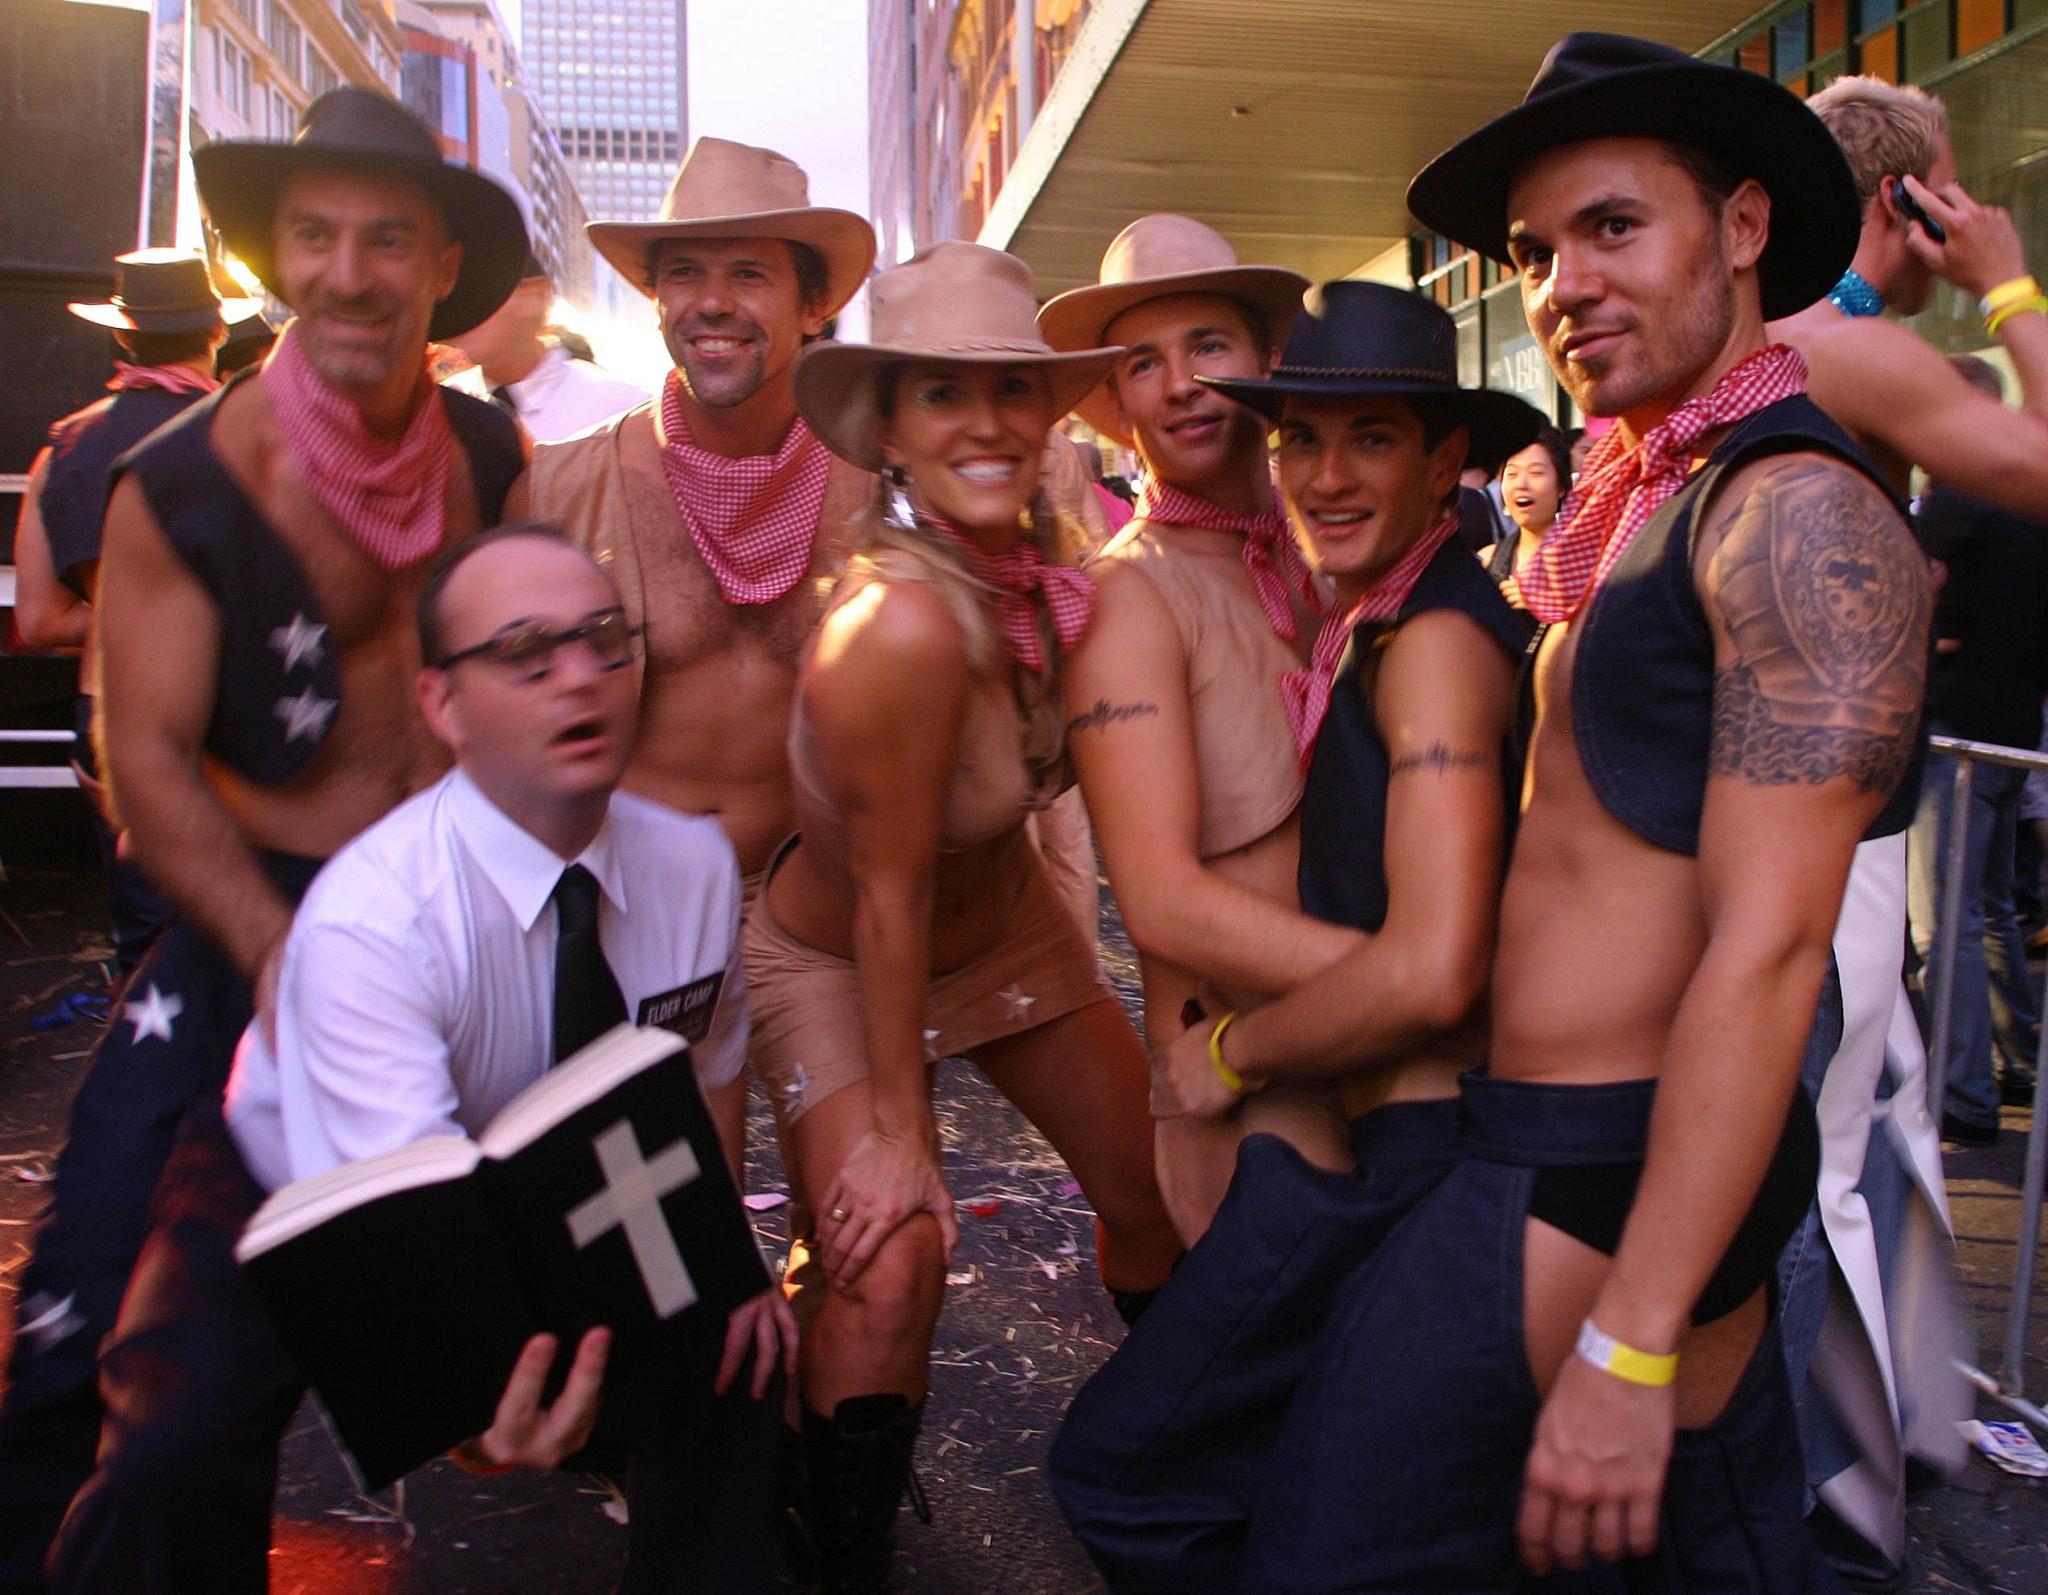 Gay orgy video porn